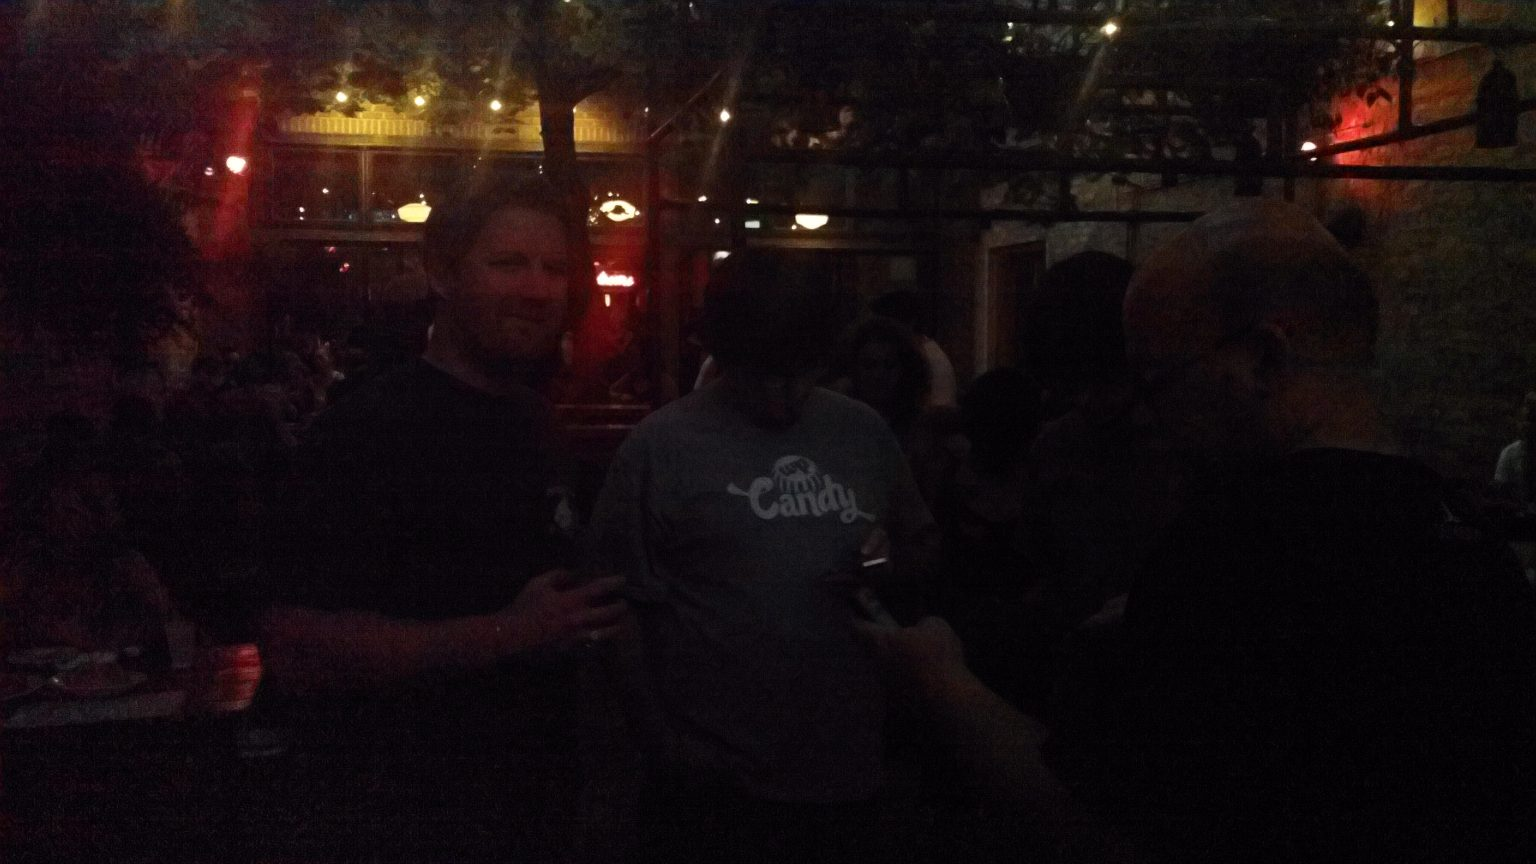 Dark shot of people standing around a beer garden looking at their phones